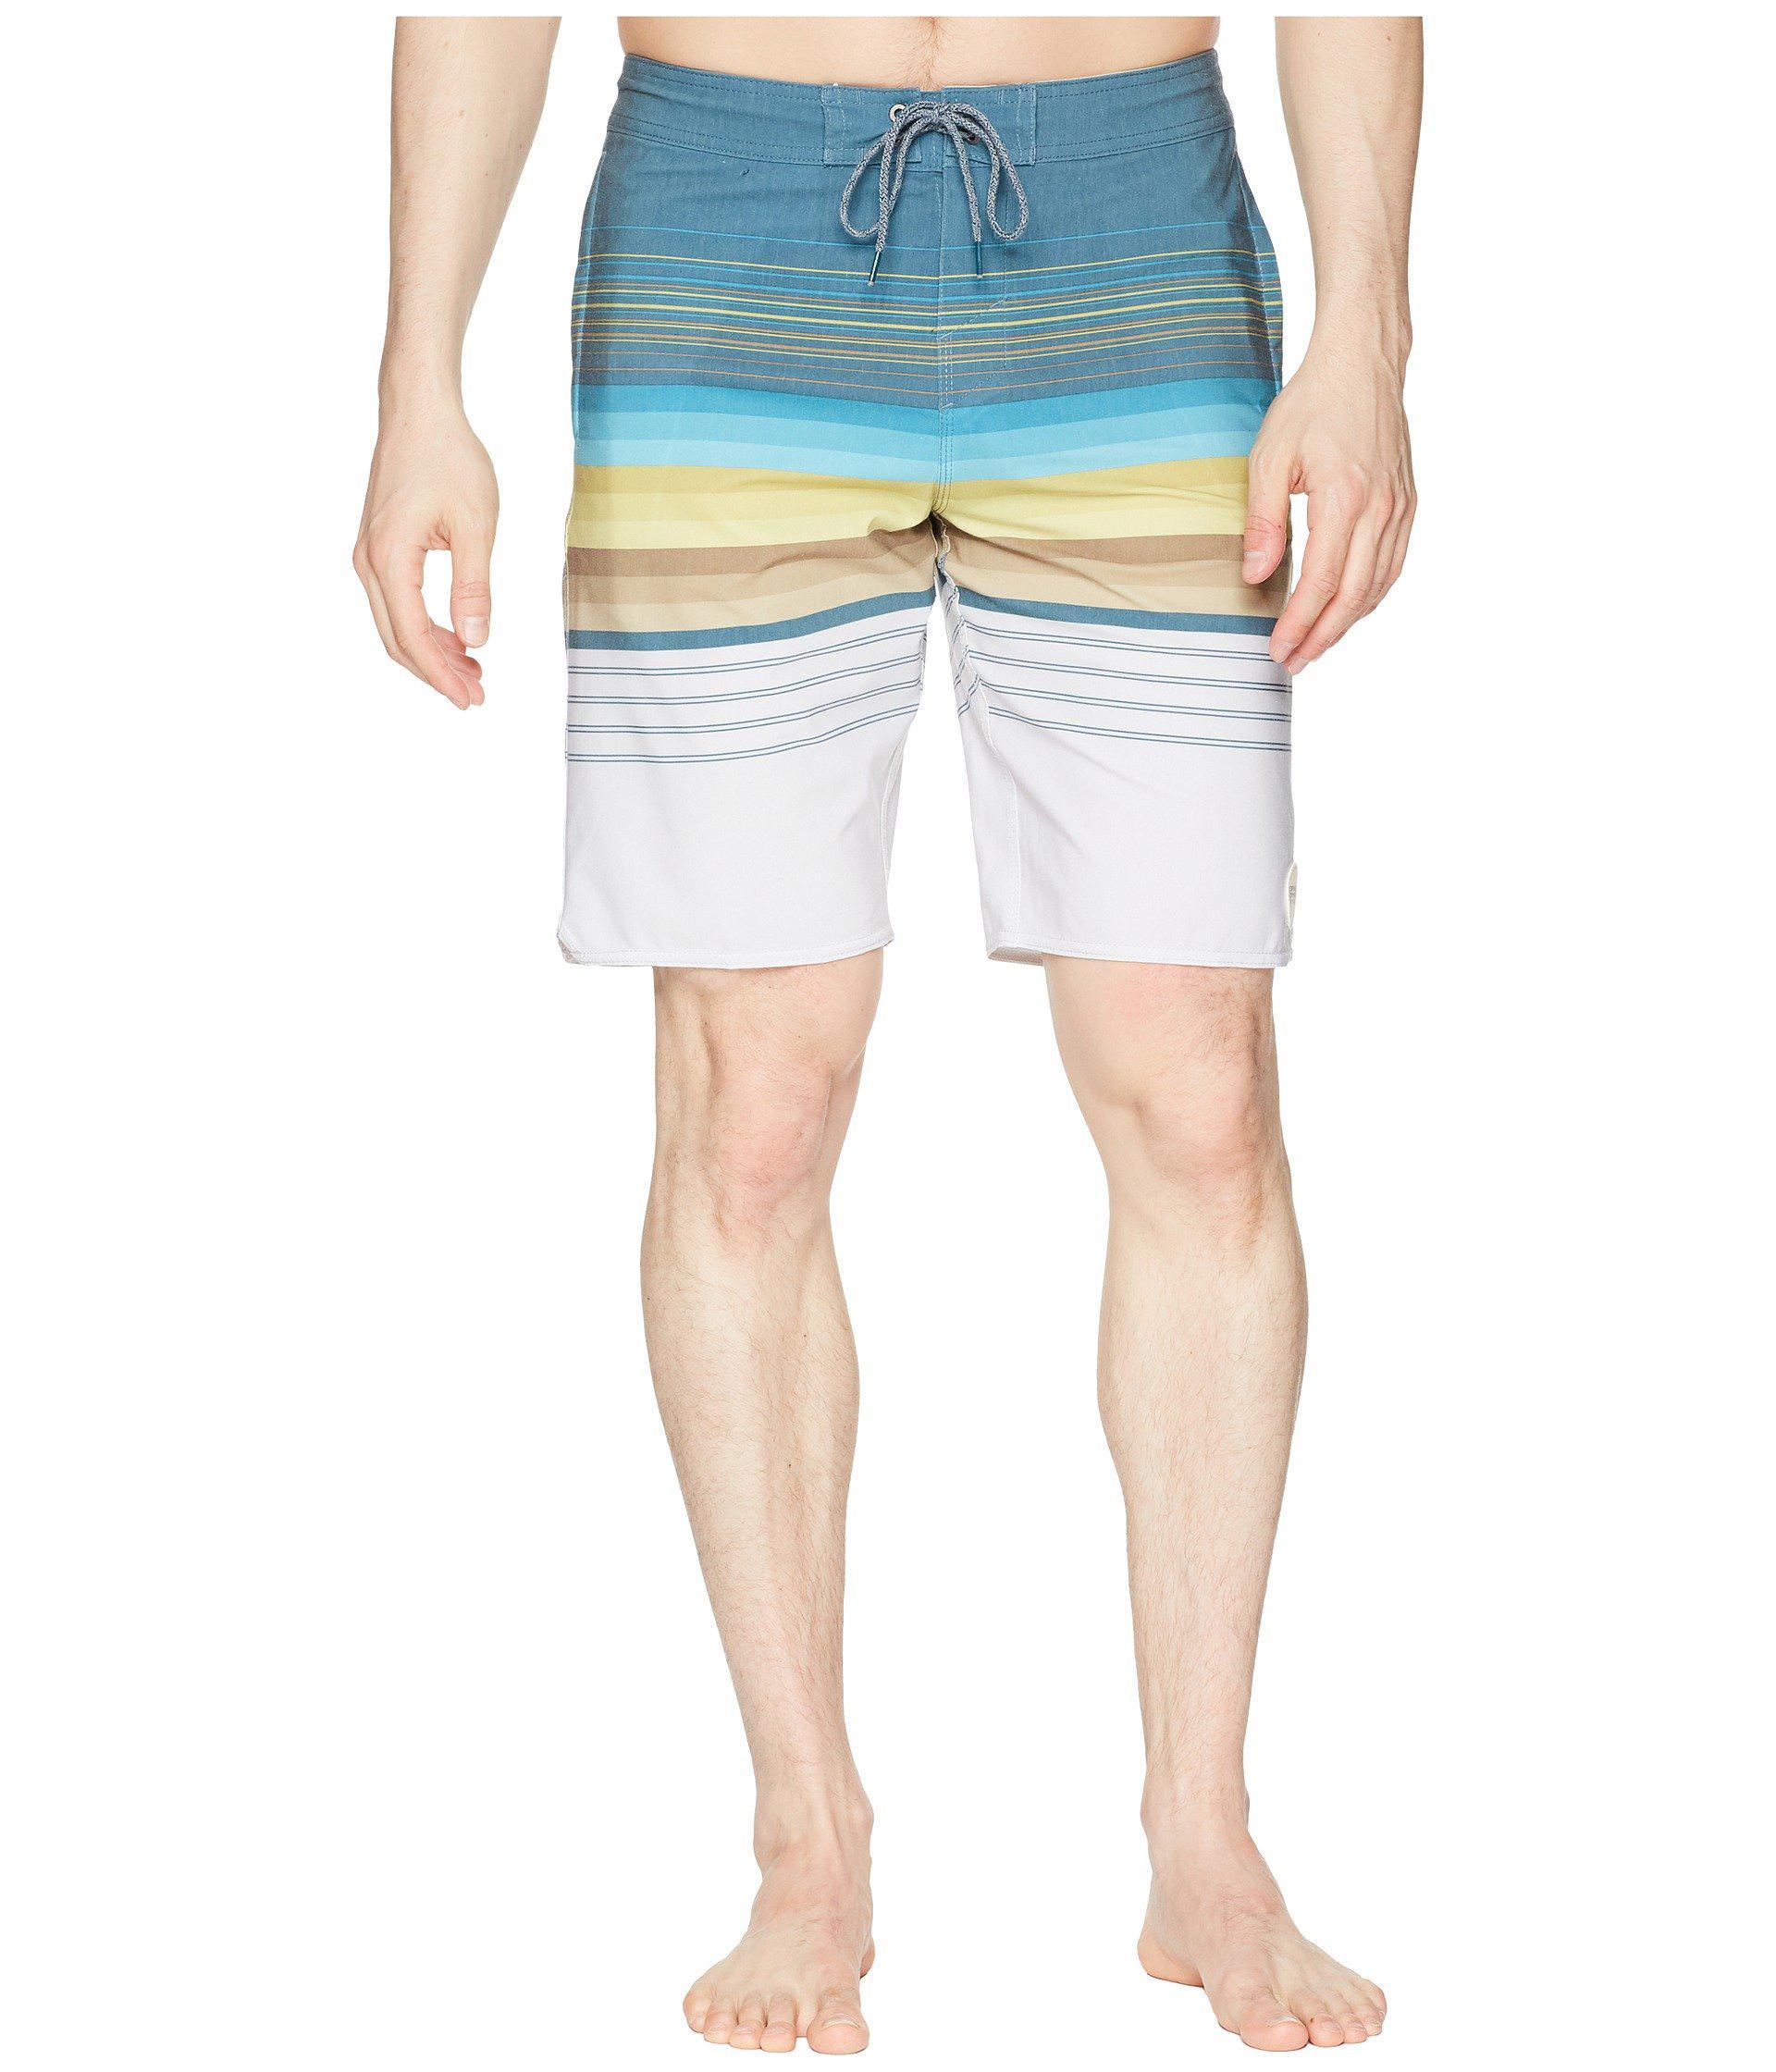 f4b764bc2f O'neill Sportswear. Men's Sandbar Cruzer Superfreak Series Boardshorts